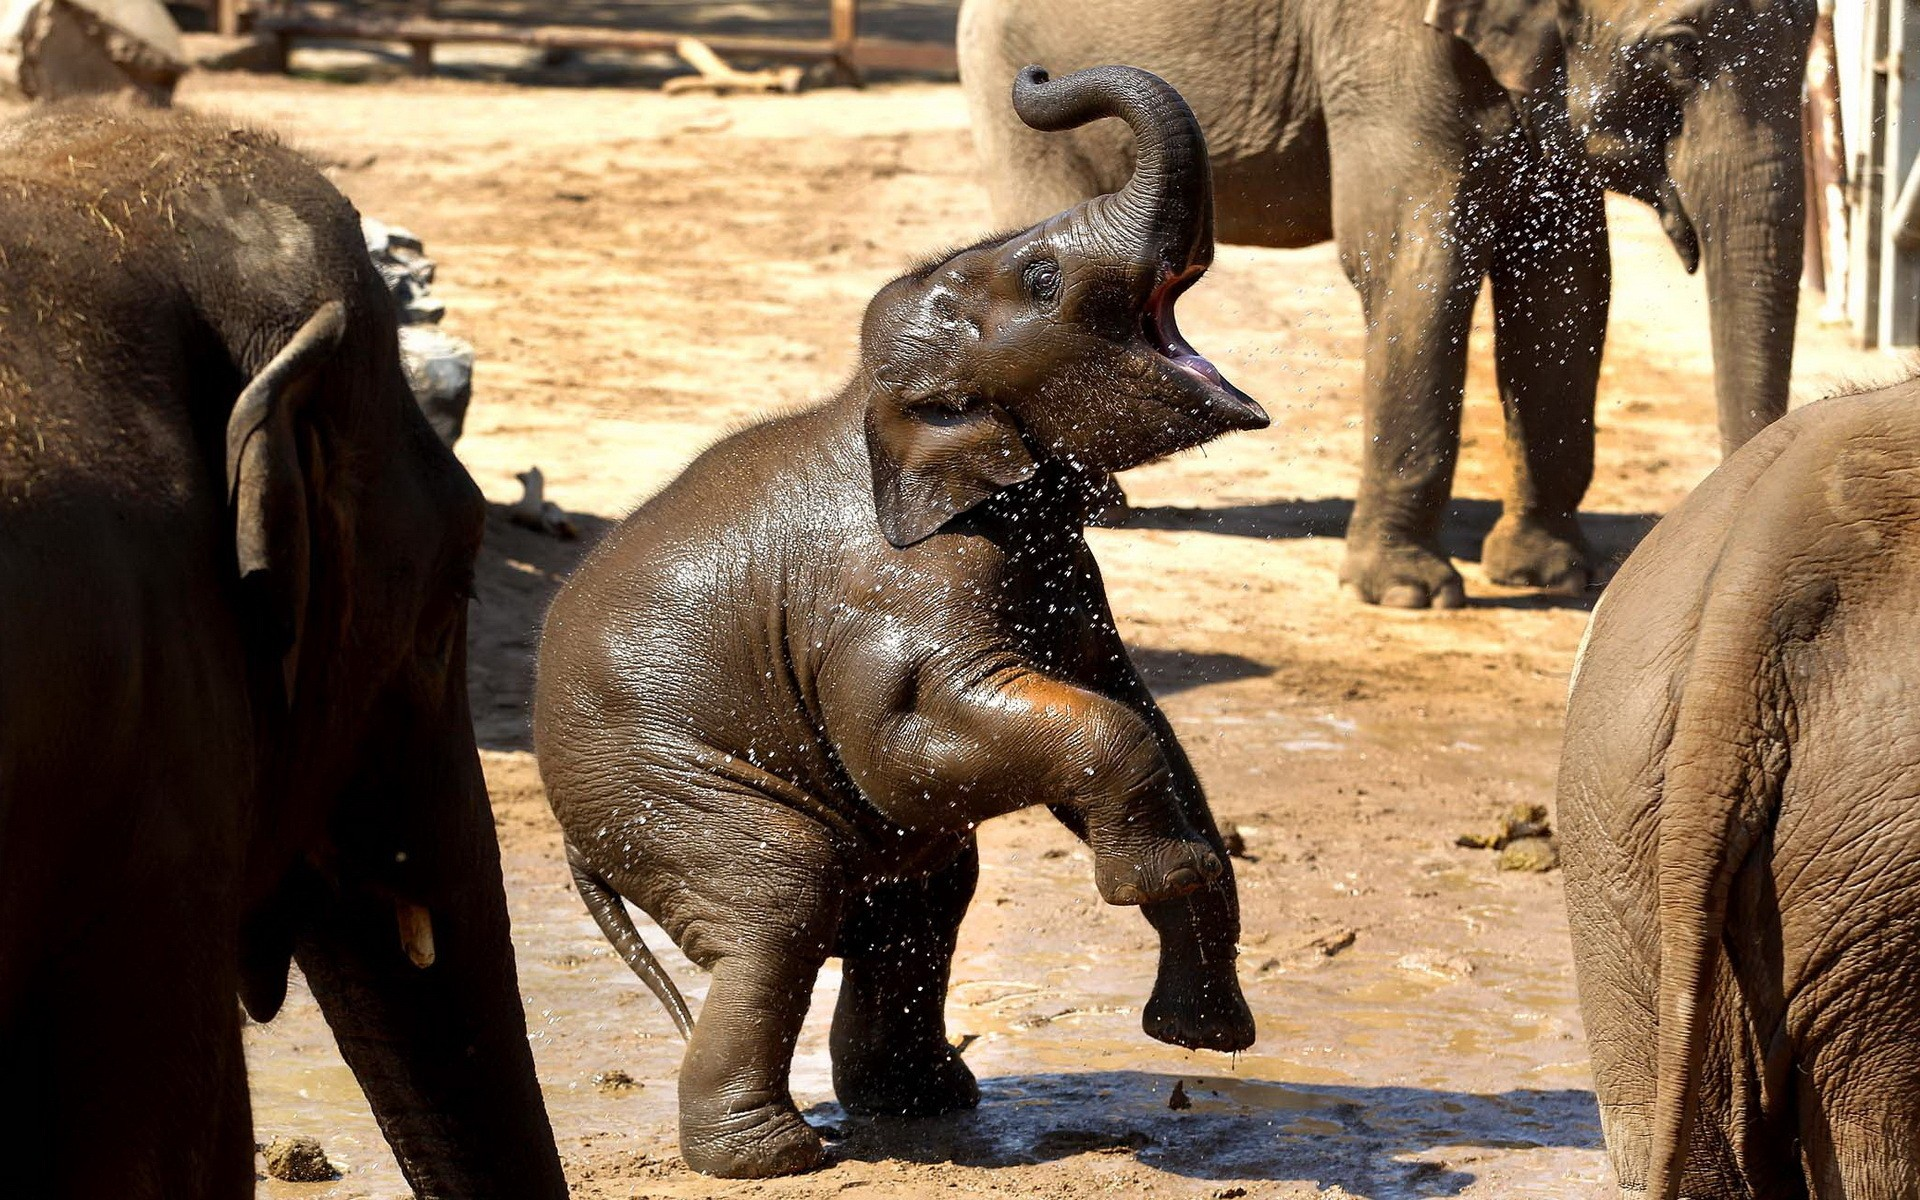 Baby elephants wallpaper - photo#51